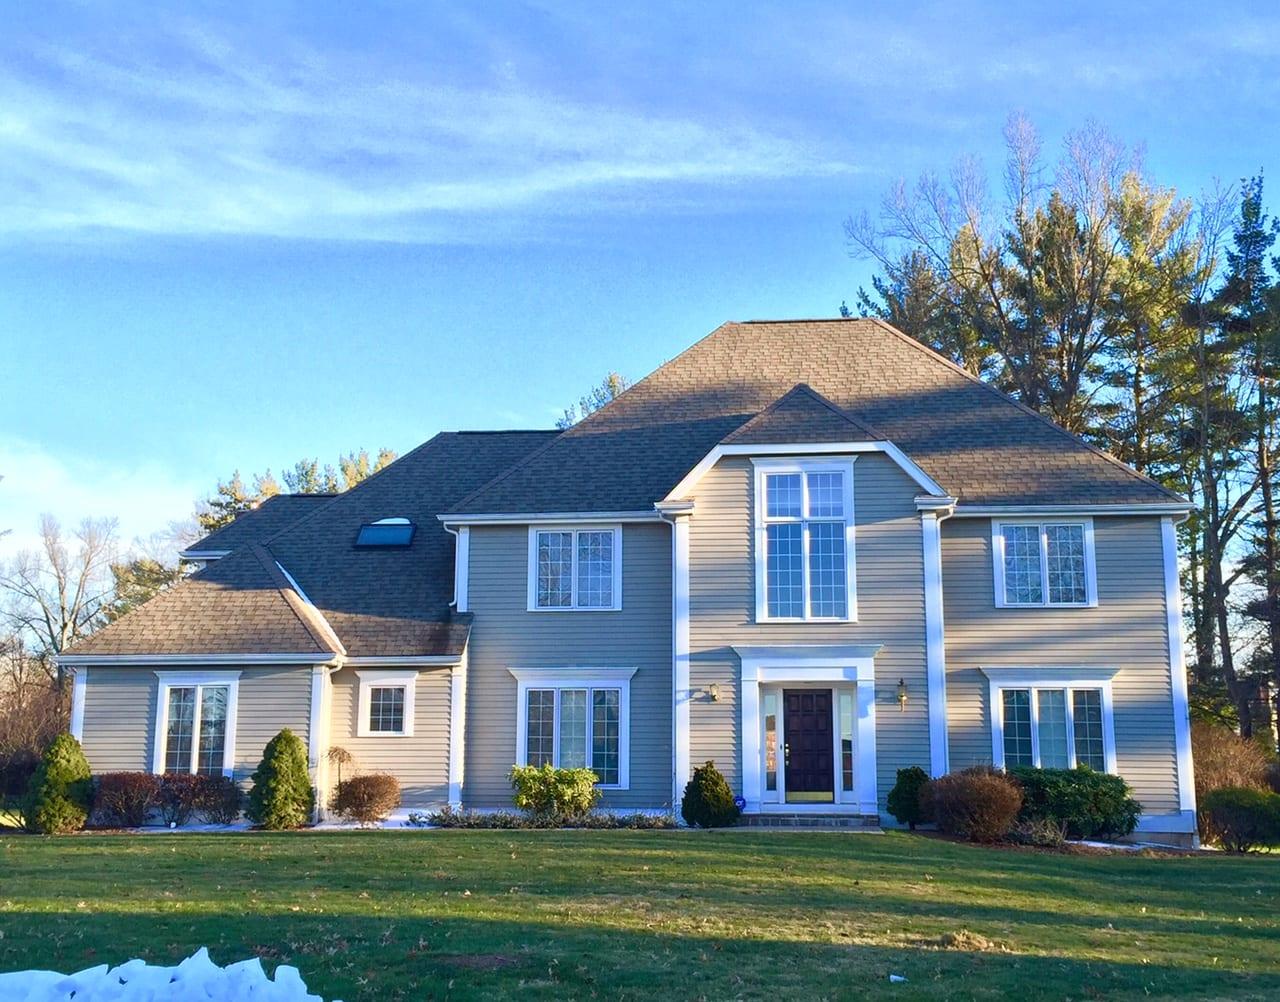 Buckingham Lane Colonial Sells for $565,000 - We-Ha   West Hartford News